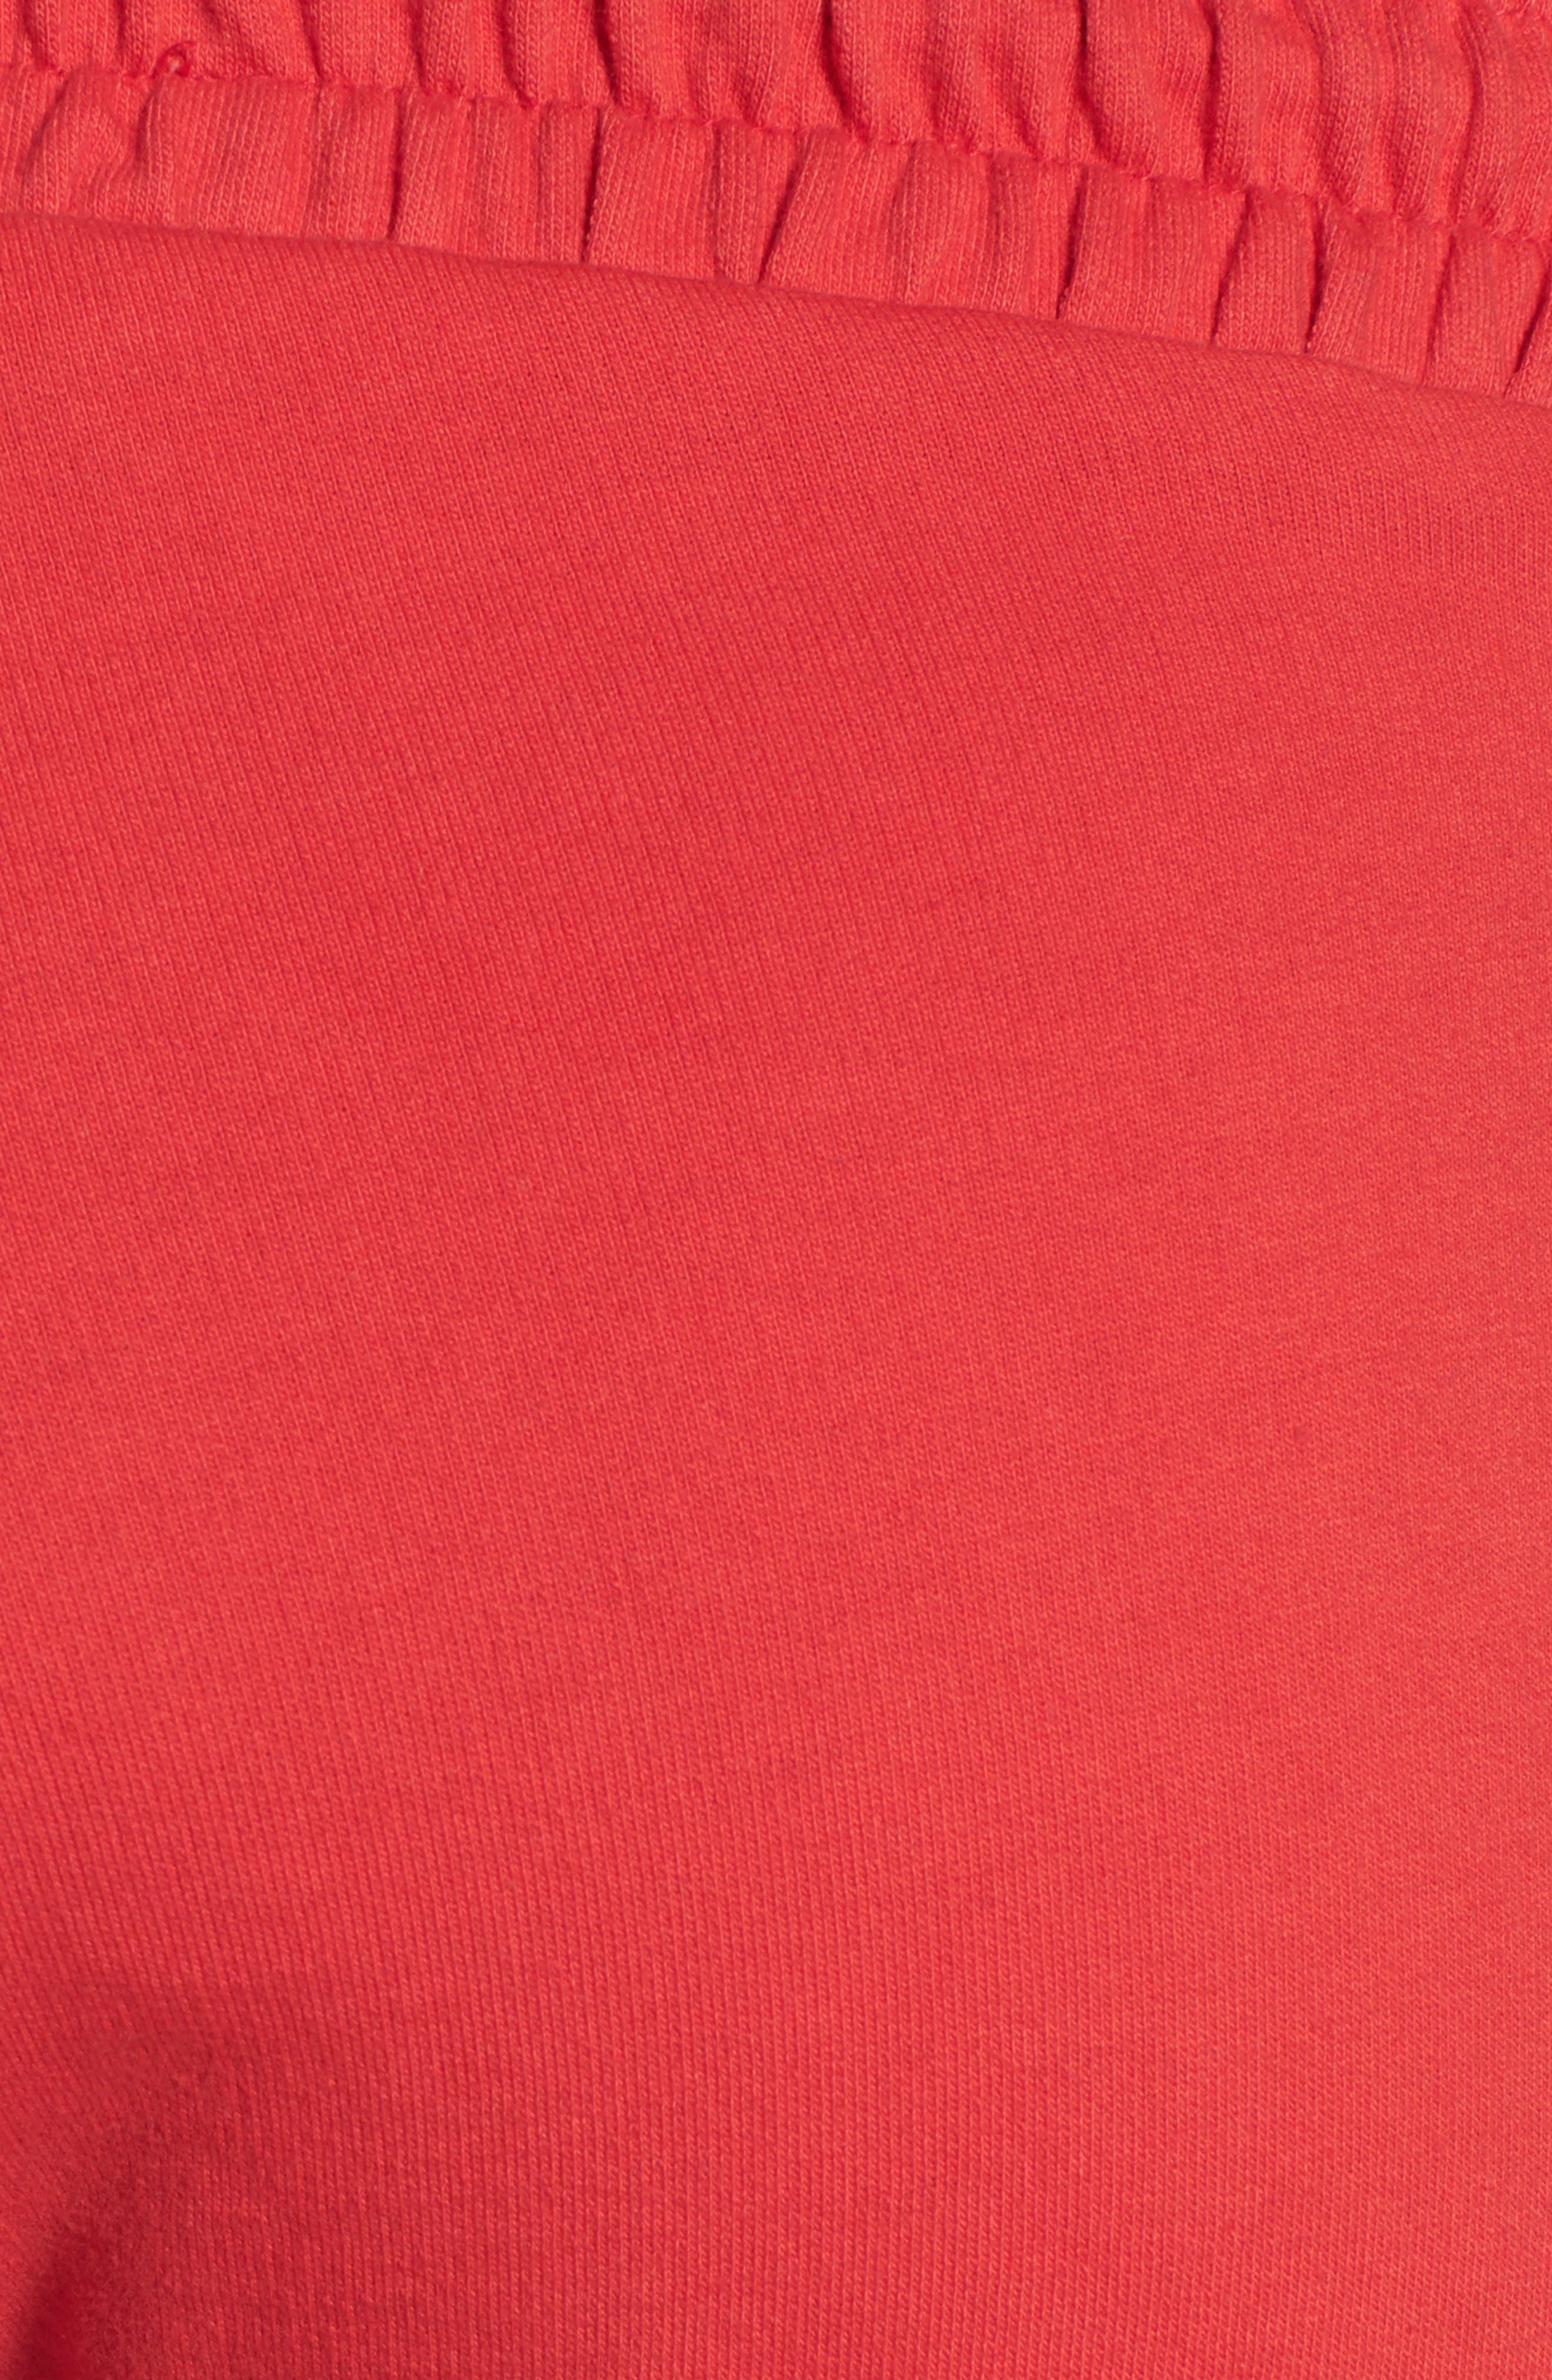 ME. Rose Sweatpants,                             Alternate thumbnail 7, color,                             CHERRY RED